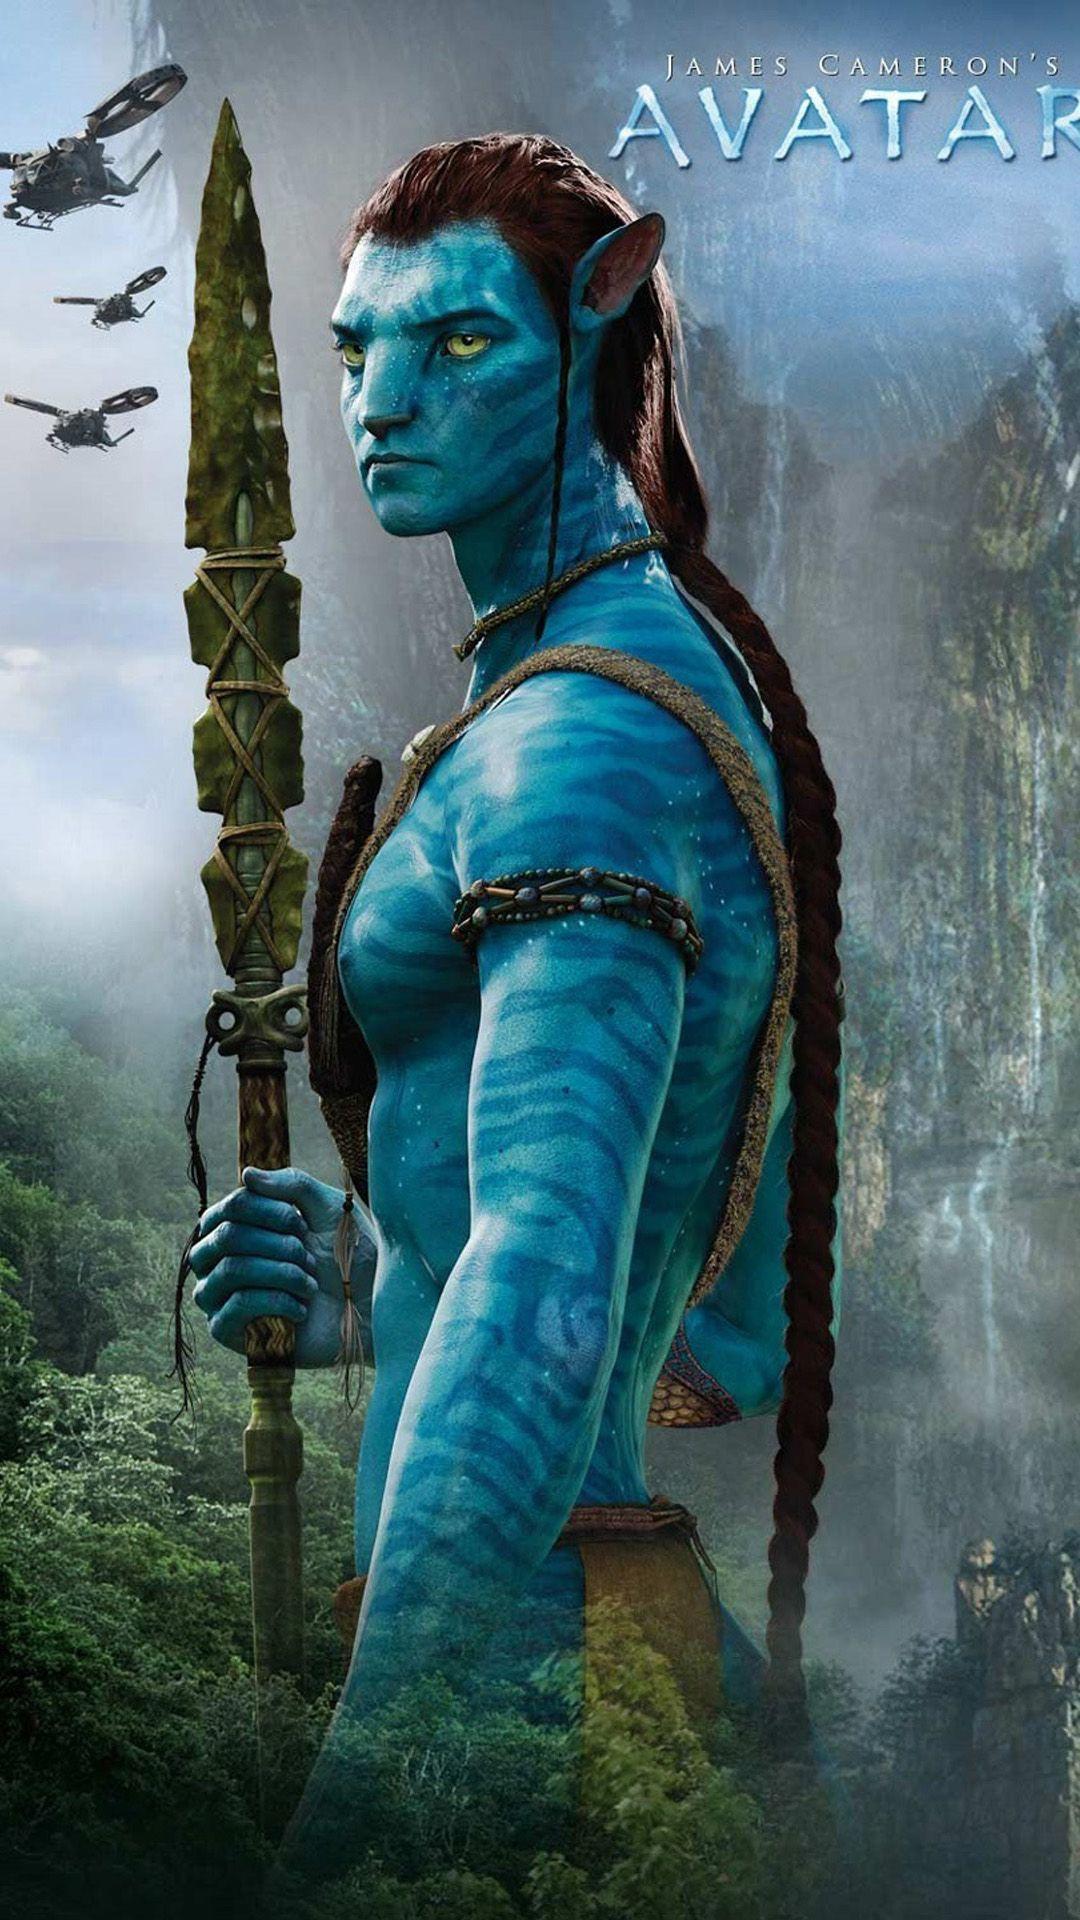 Avatar Movie Hd Wallpaper Avatar Movie Avatar Poster Pandora Avatar